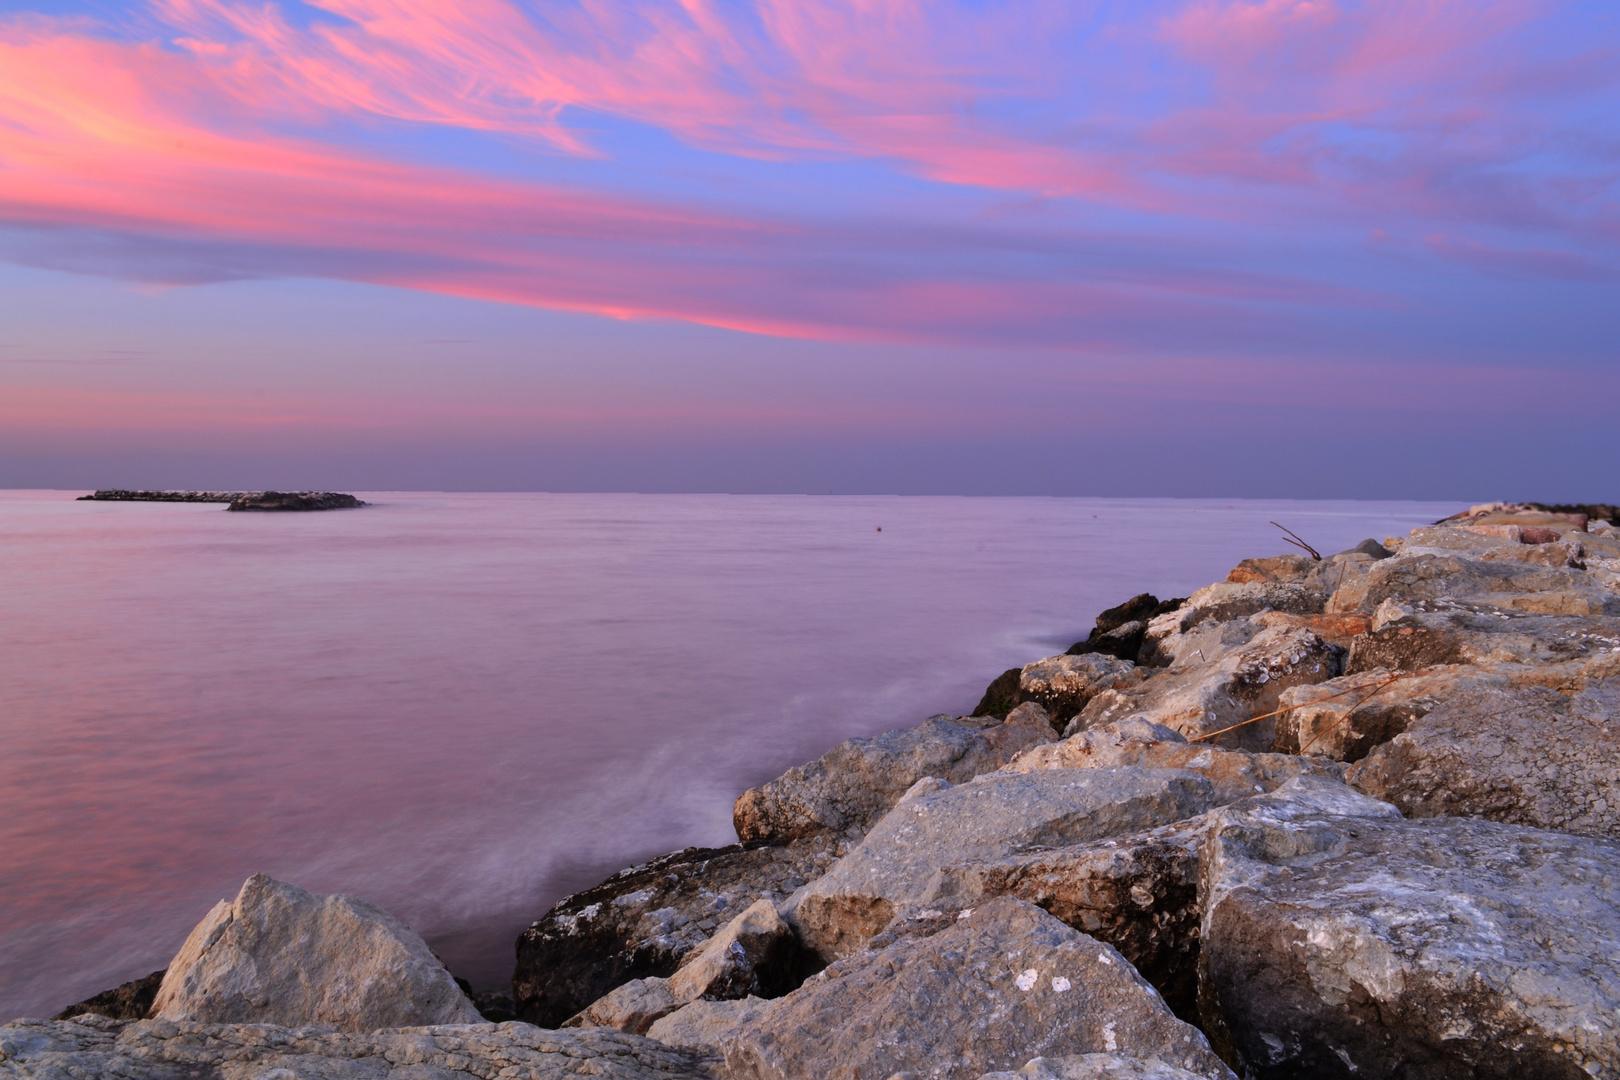 Sonnenuntergang in Rimini